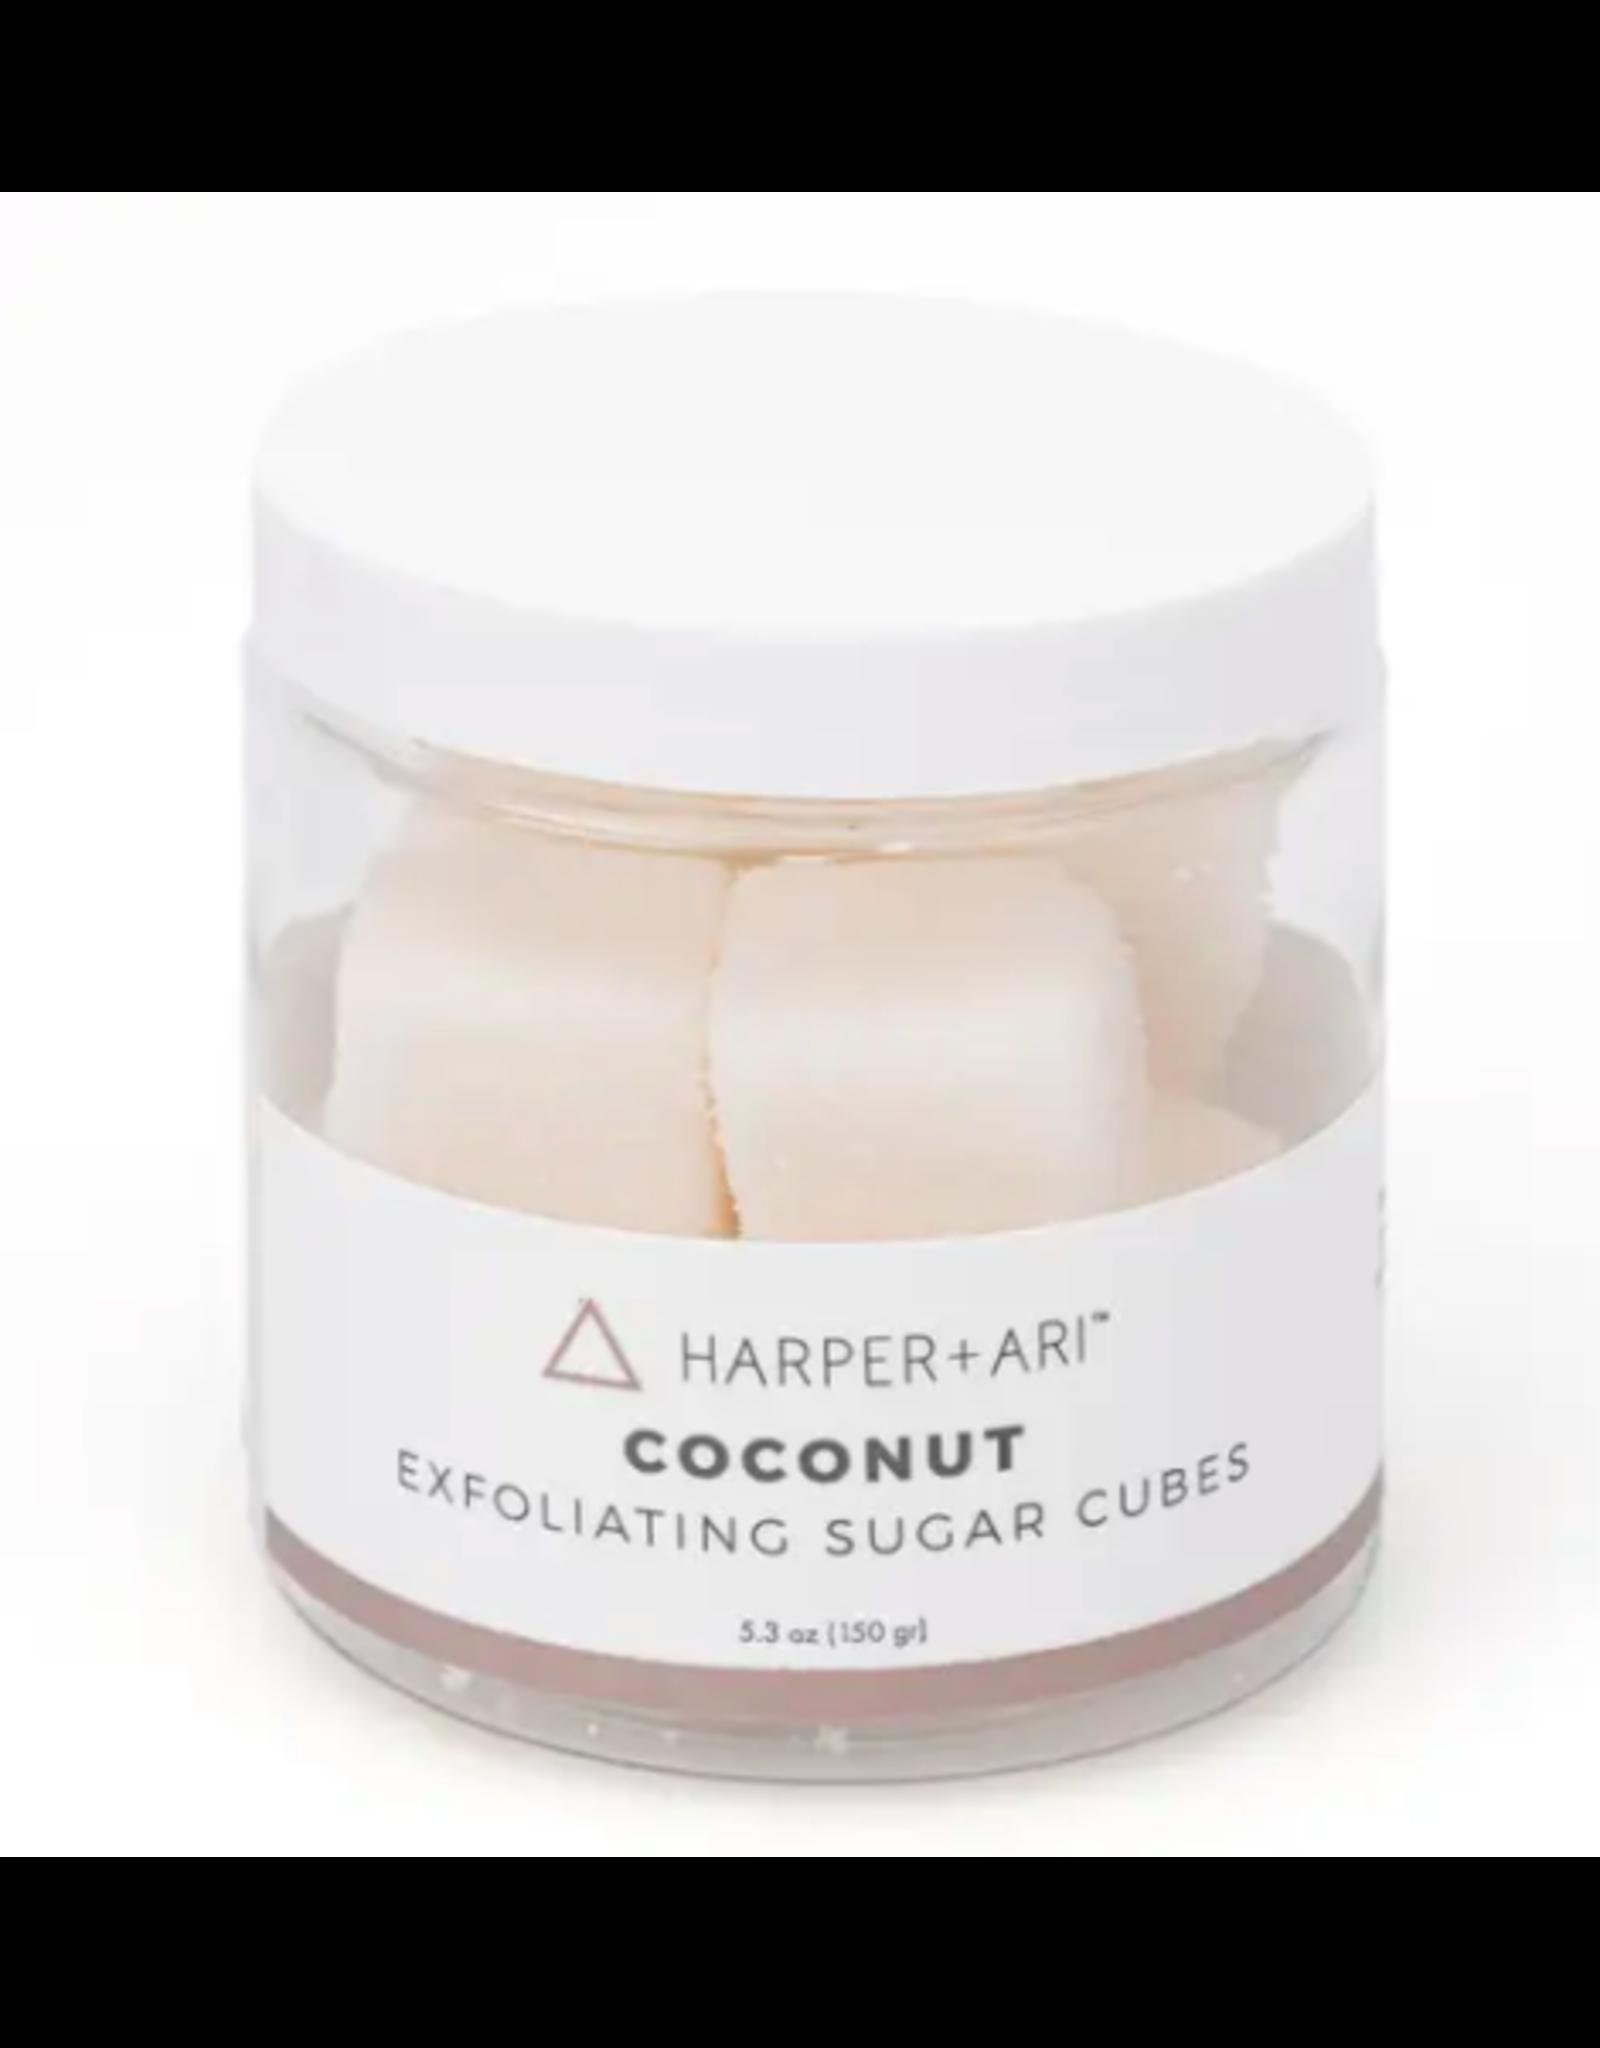 Harper + Ari Small Sugar Cubes Coconut